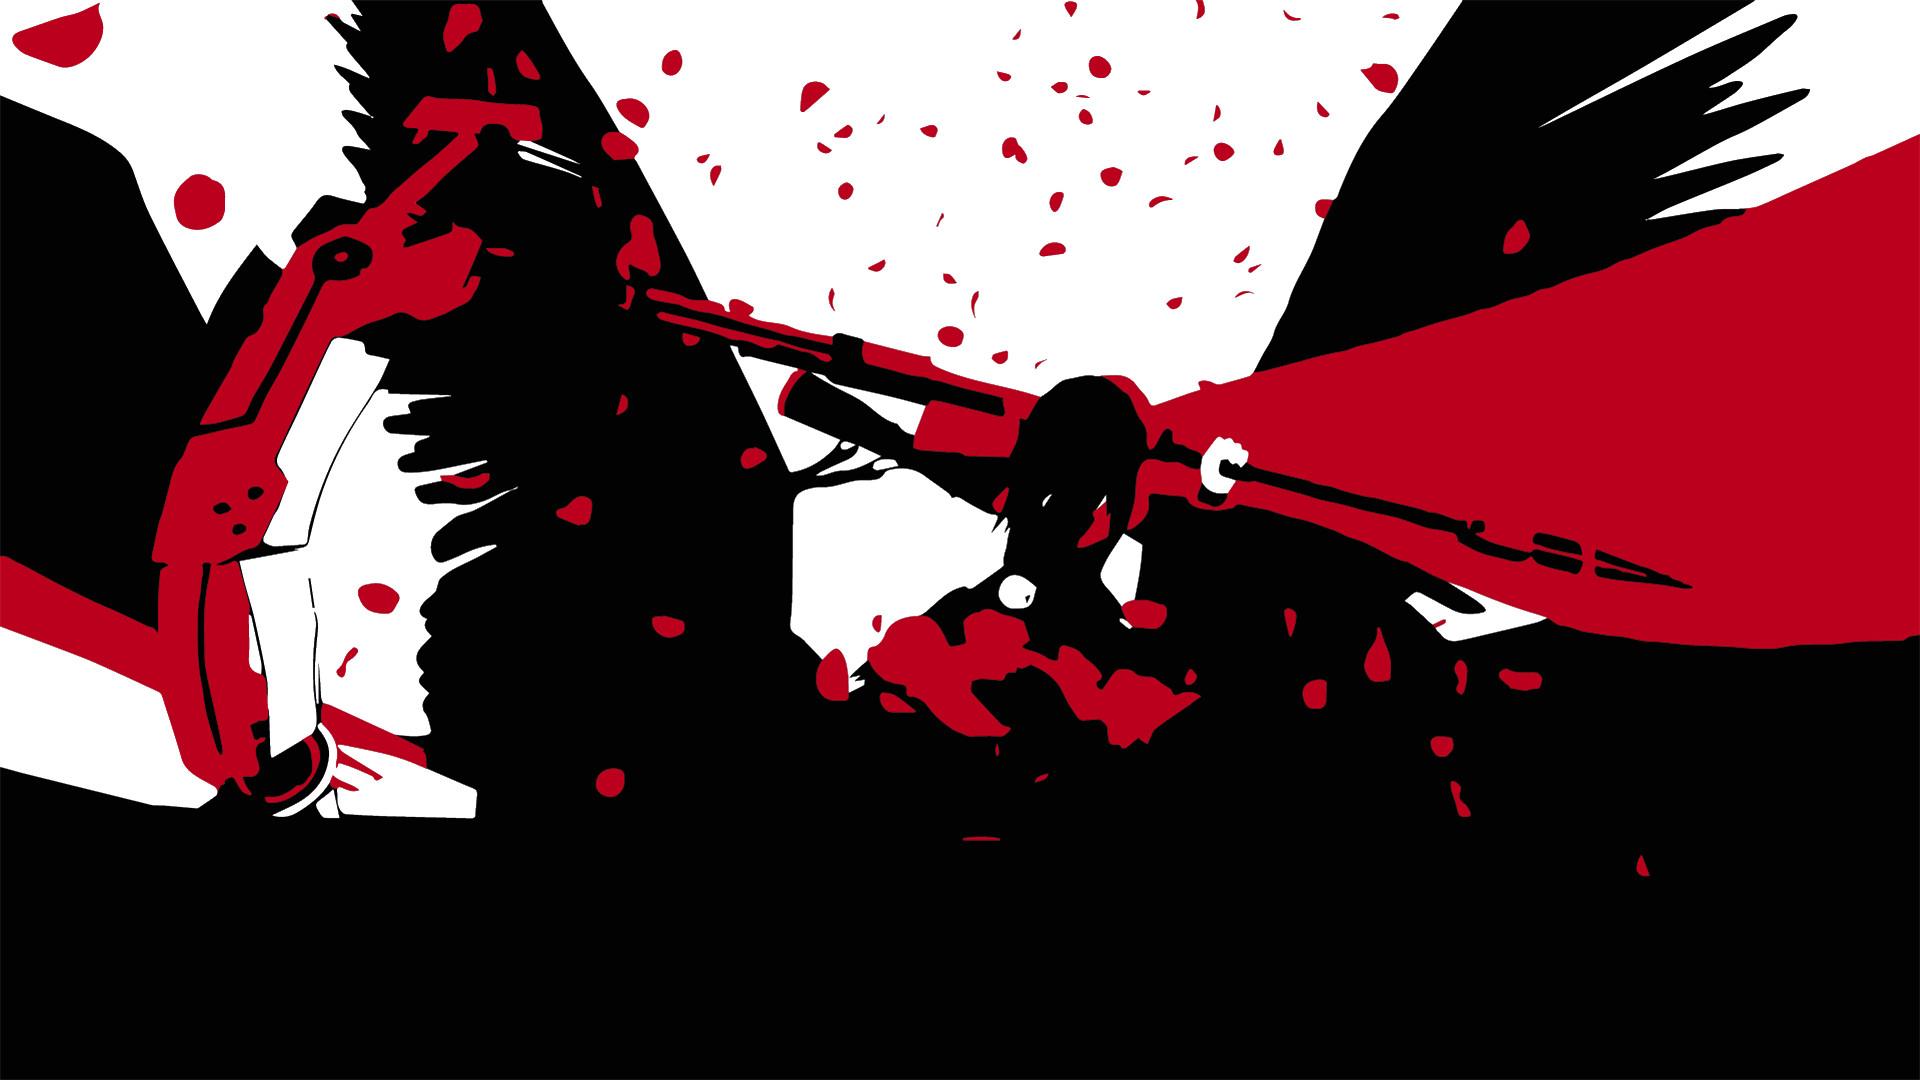 Anime <b>RWBY wallpapers</b> (Desktop, Phone, Tablet